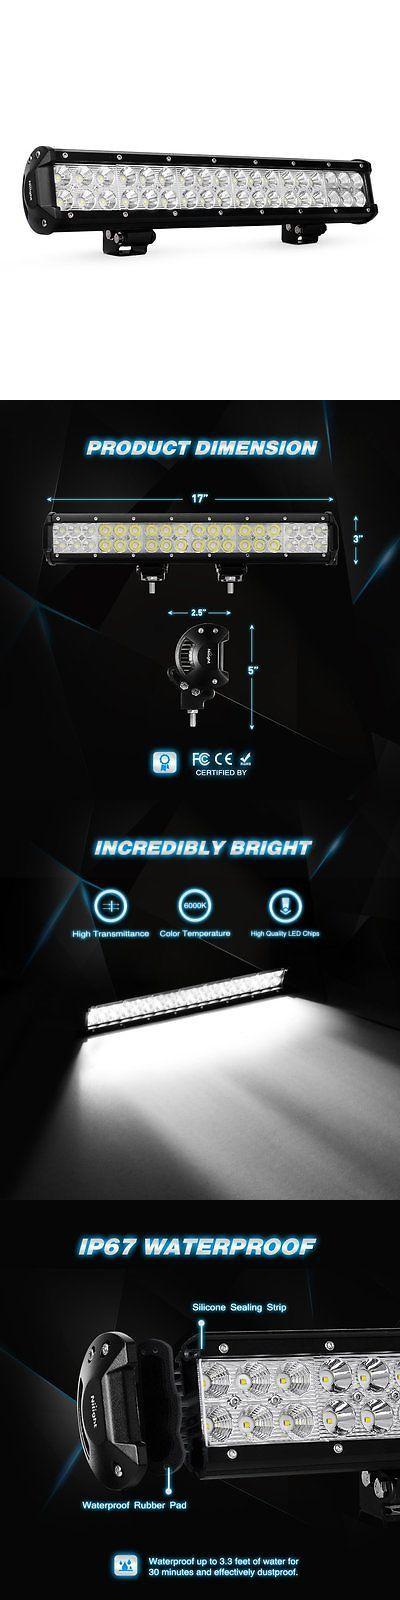 Float Tubes 179995: Nilight Light Bar 17 108W Led Lights Spot Flood Combo Led Off Road Lights Led -> BUY IT NOW ONLY: $50.98 on eBay!